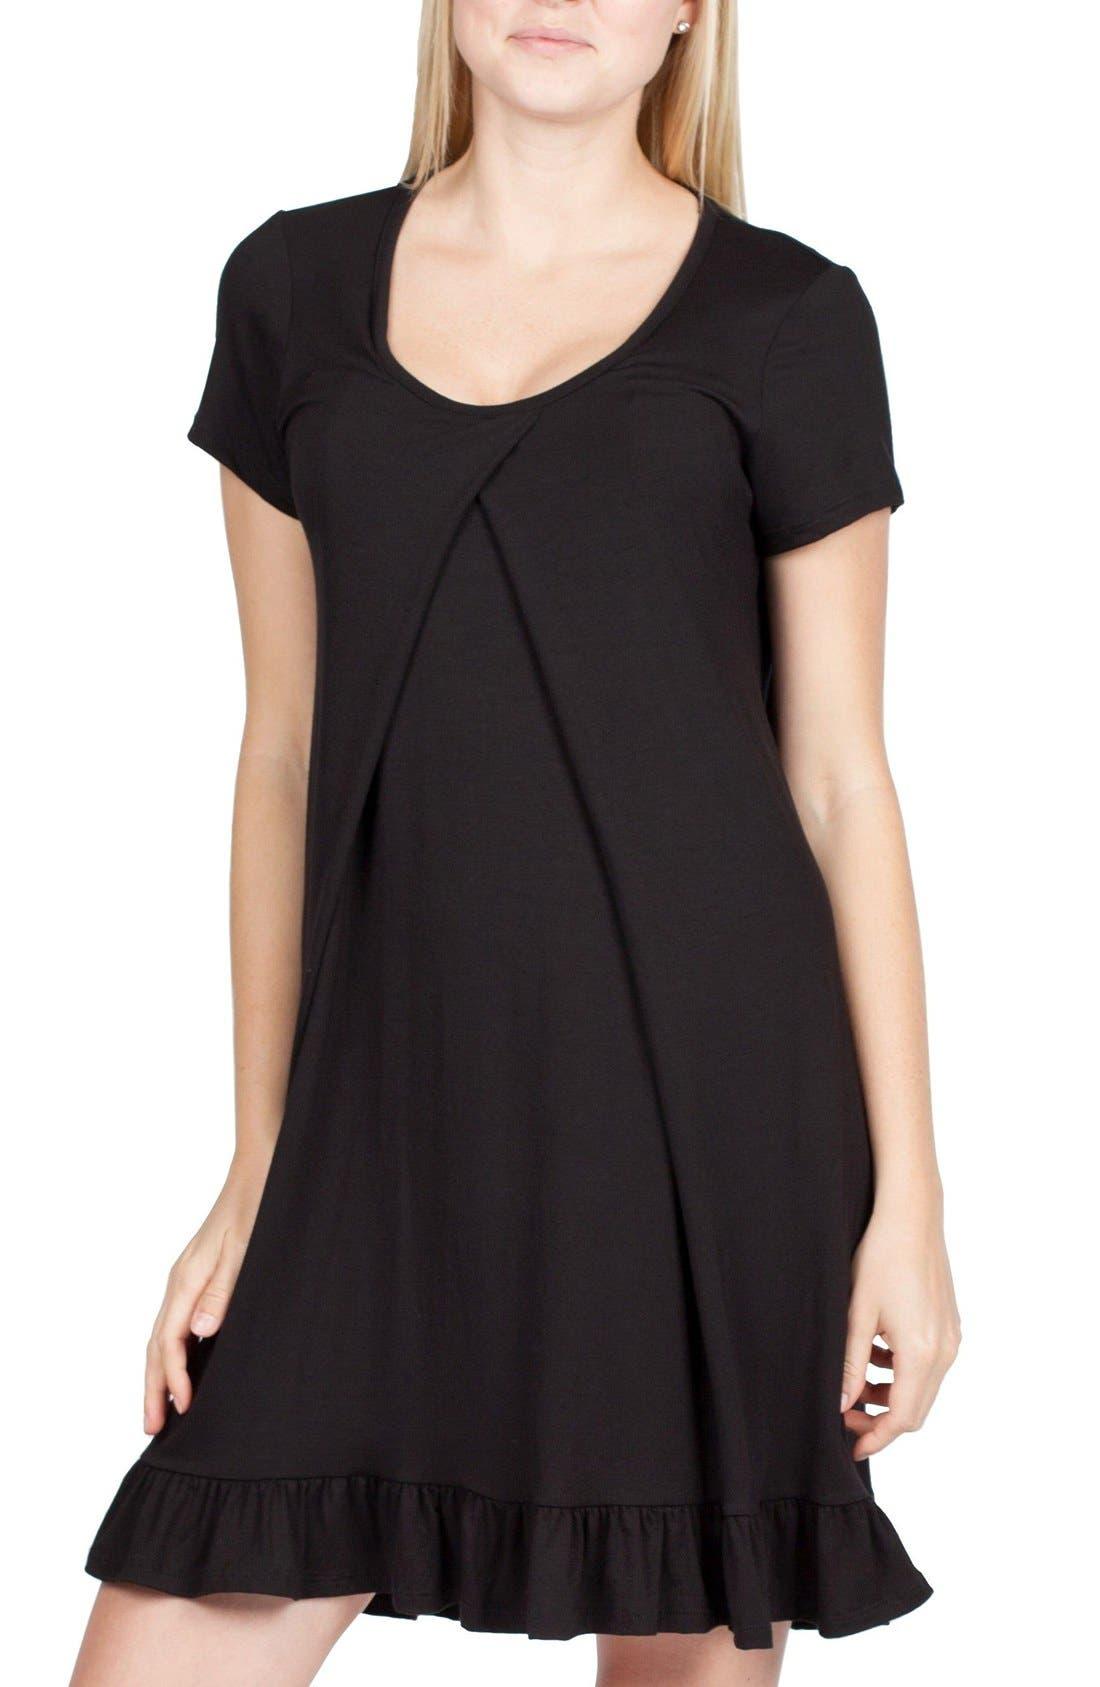 San Francisco Maternity/Nursing Nightgown,                             Alternate thumbnail 4, color,                             BLACK